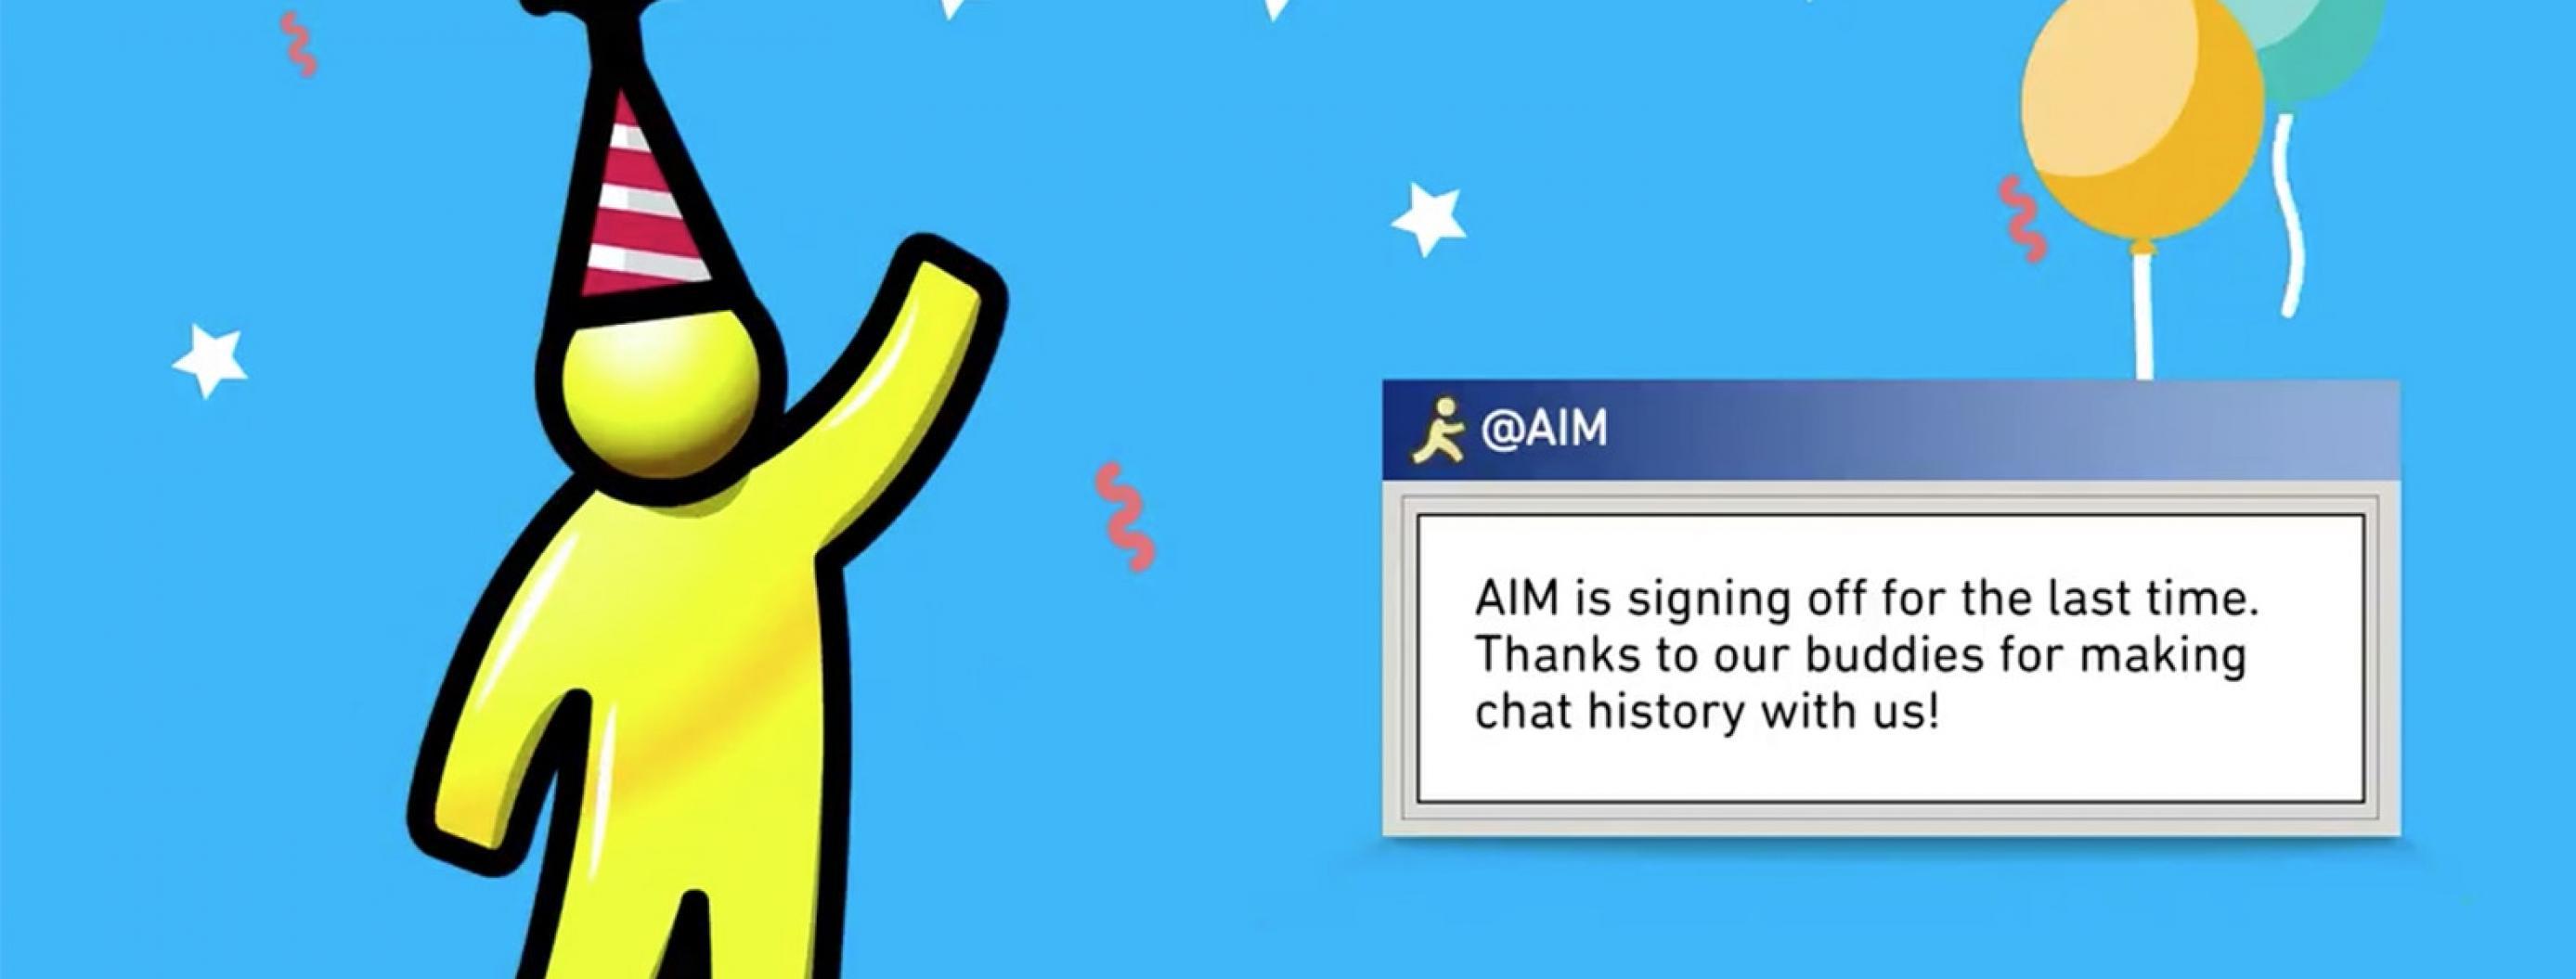 End of an Era: AOL Instant Messenger Officially Shutting Down in December